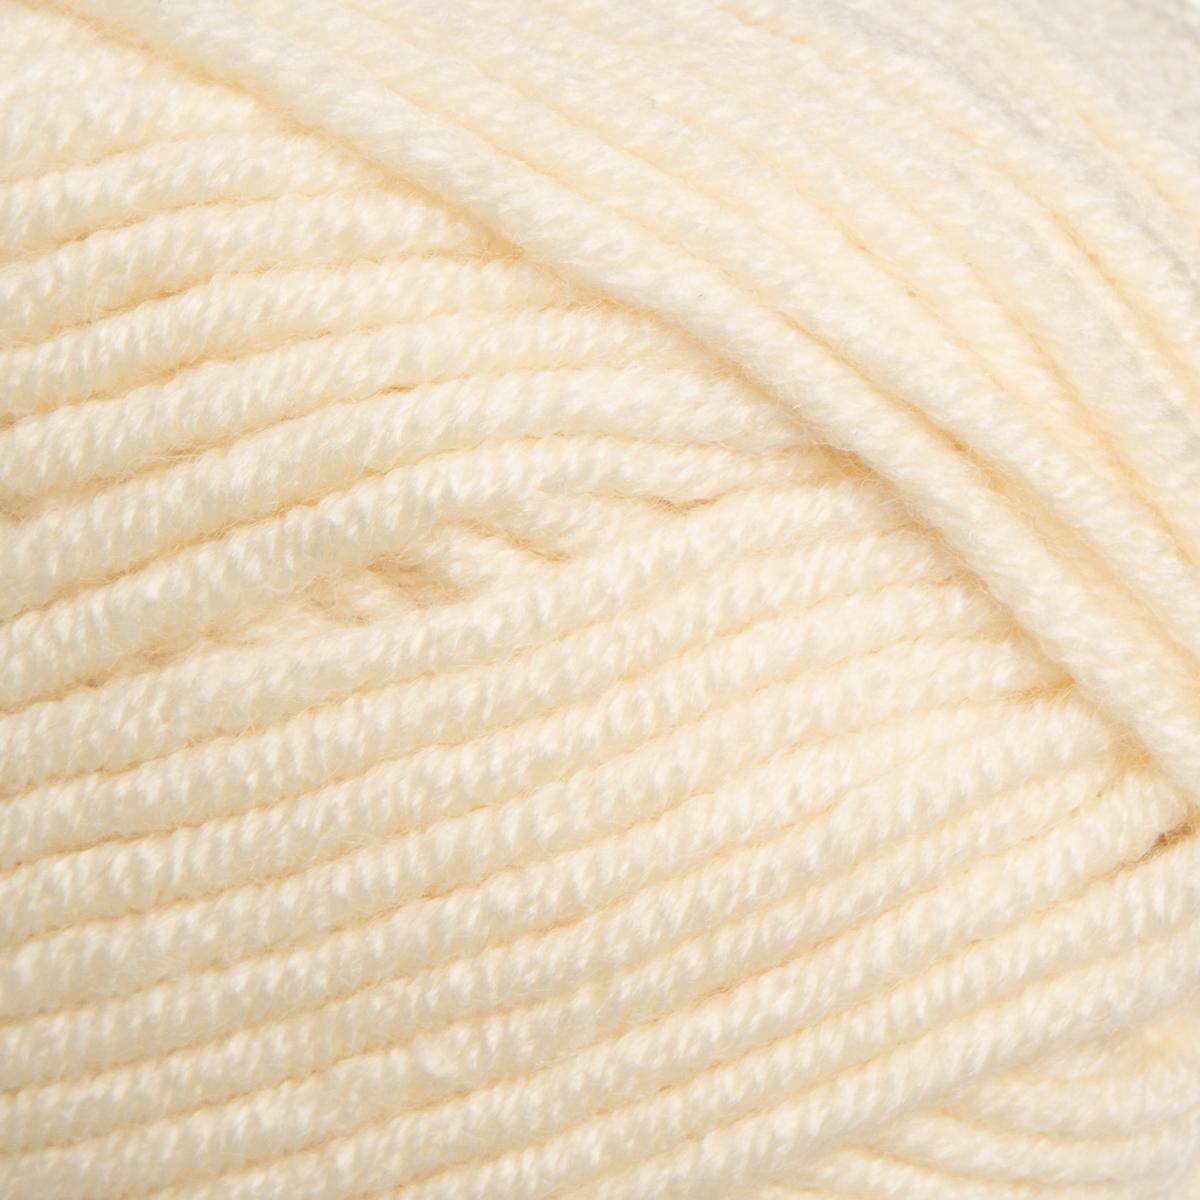 3pk-Lion-Brand-Woolspun-Acrylic-amp-Wool-Yarn-Bulky-5-Knit-Crocheting-Skeins-Soft thumbnail 35